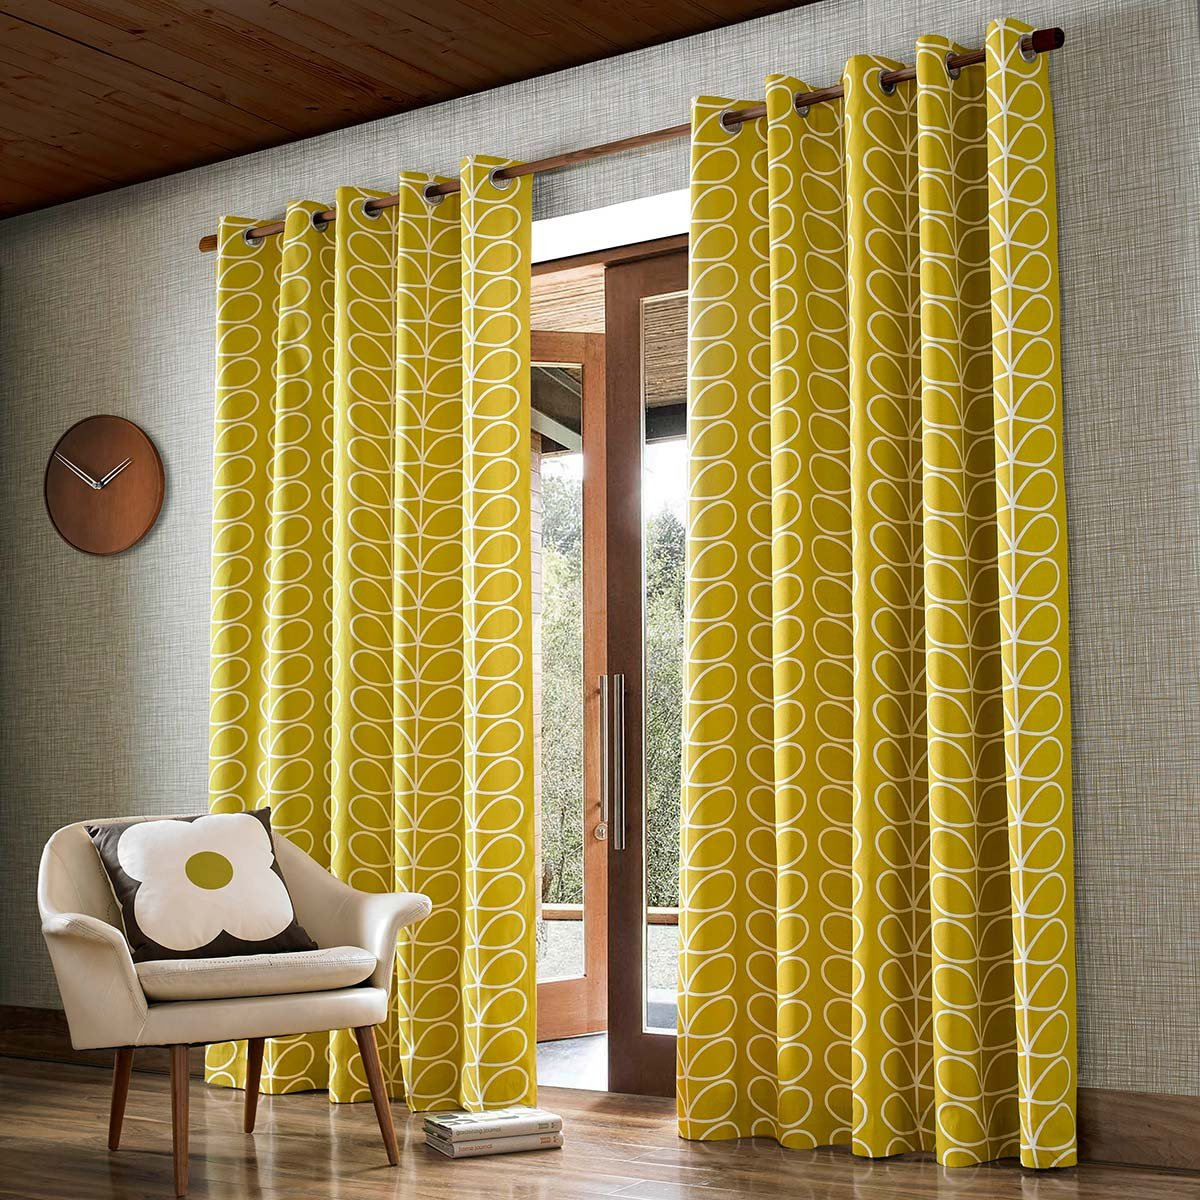 Orla Kiely Linear Stem Eyelet Curtains, Dandelion - Width 66